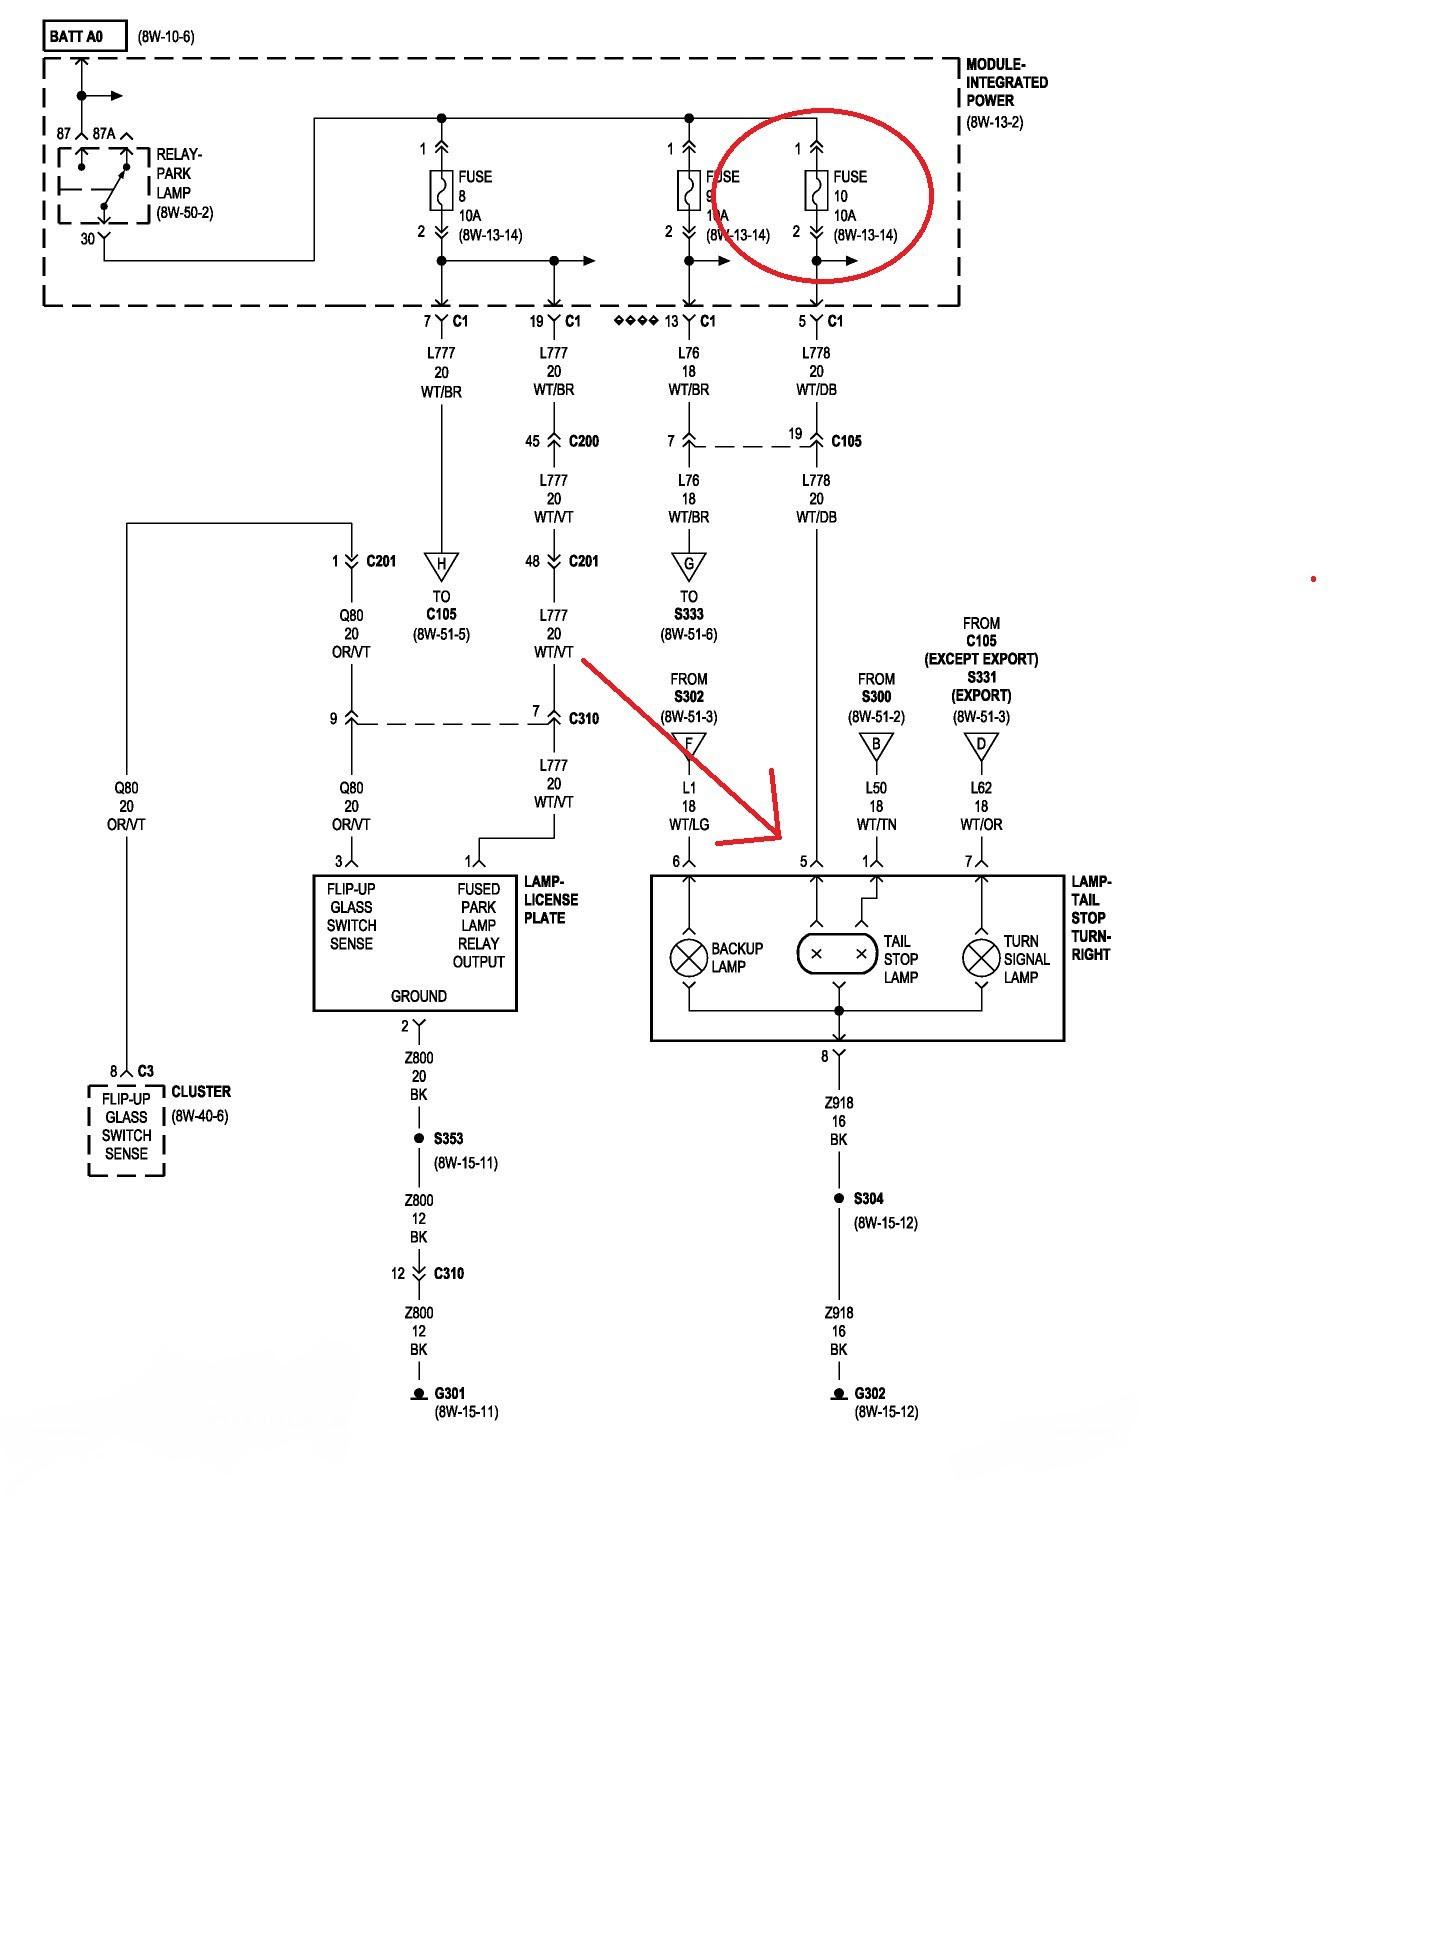 diagram] 2004 jeep grand cherokee tail light wiring diagram full version hd  quality wiring diagram - doordiagram3.tradecompanyholding.it  doordiagram3.tradecompanyholding.it